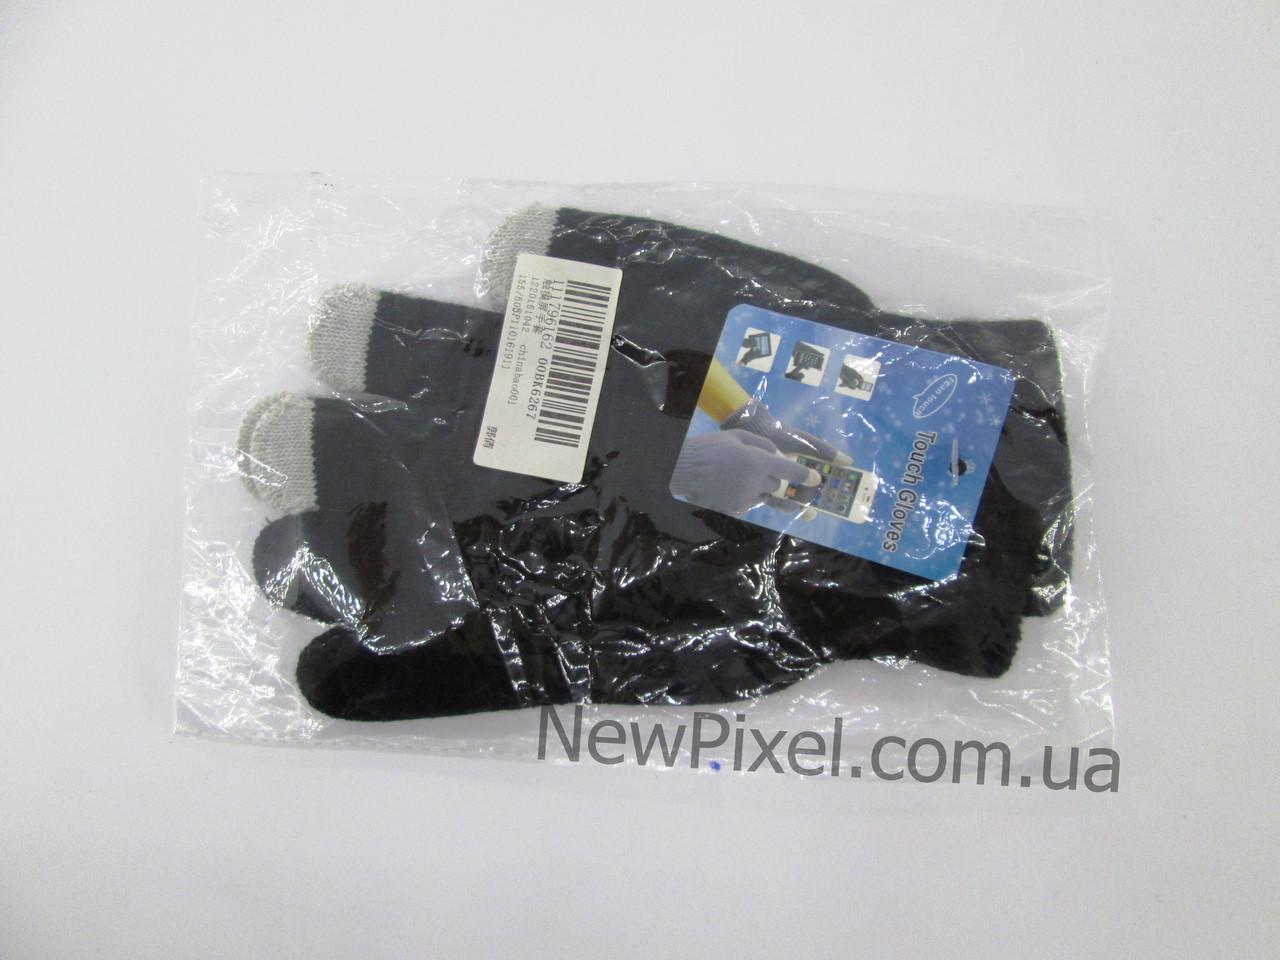 Перчатки для сенсорных экранов Touch Glove